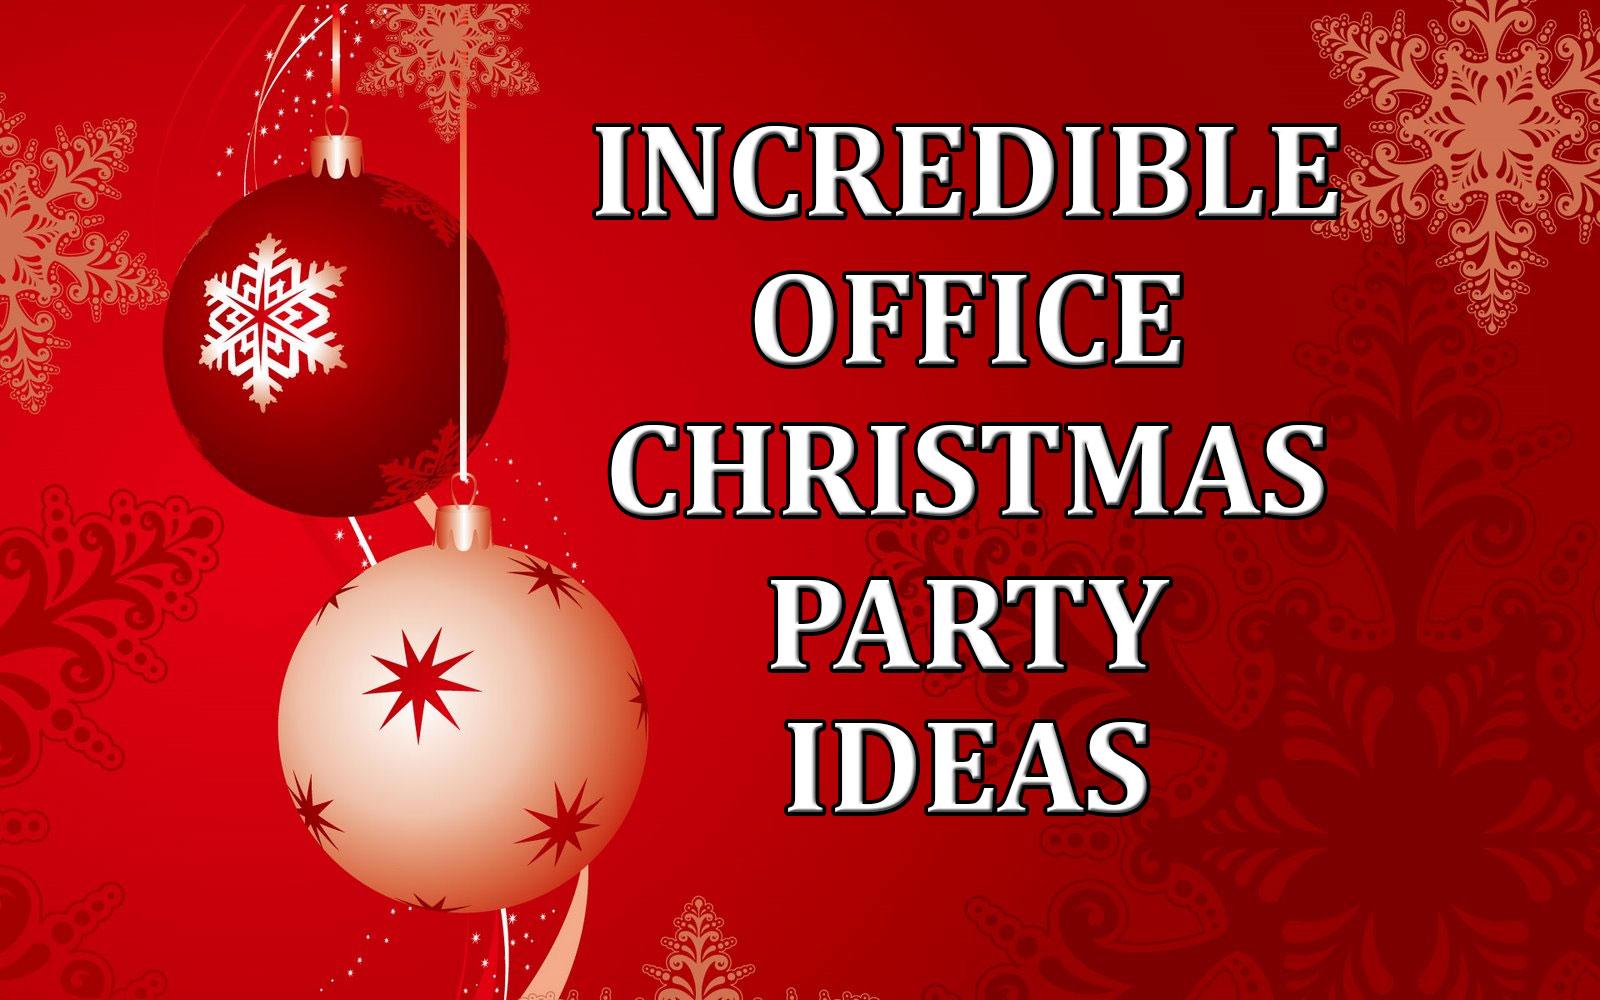 Office Holiday Party Jokes